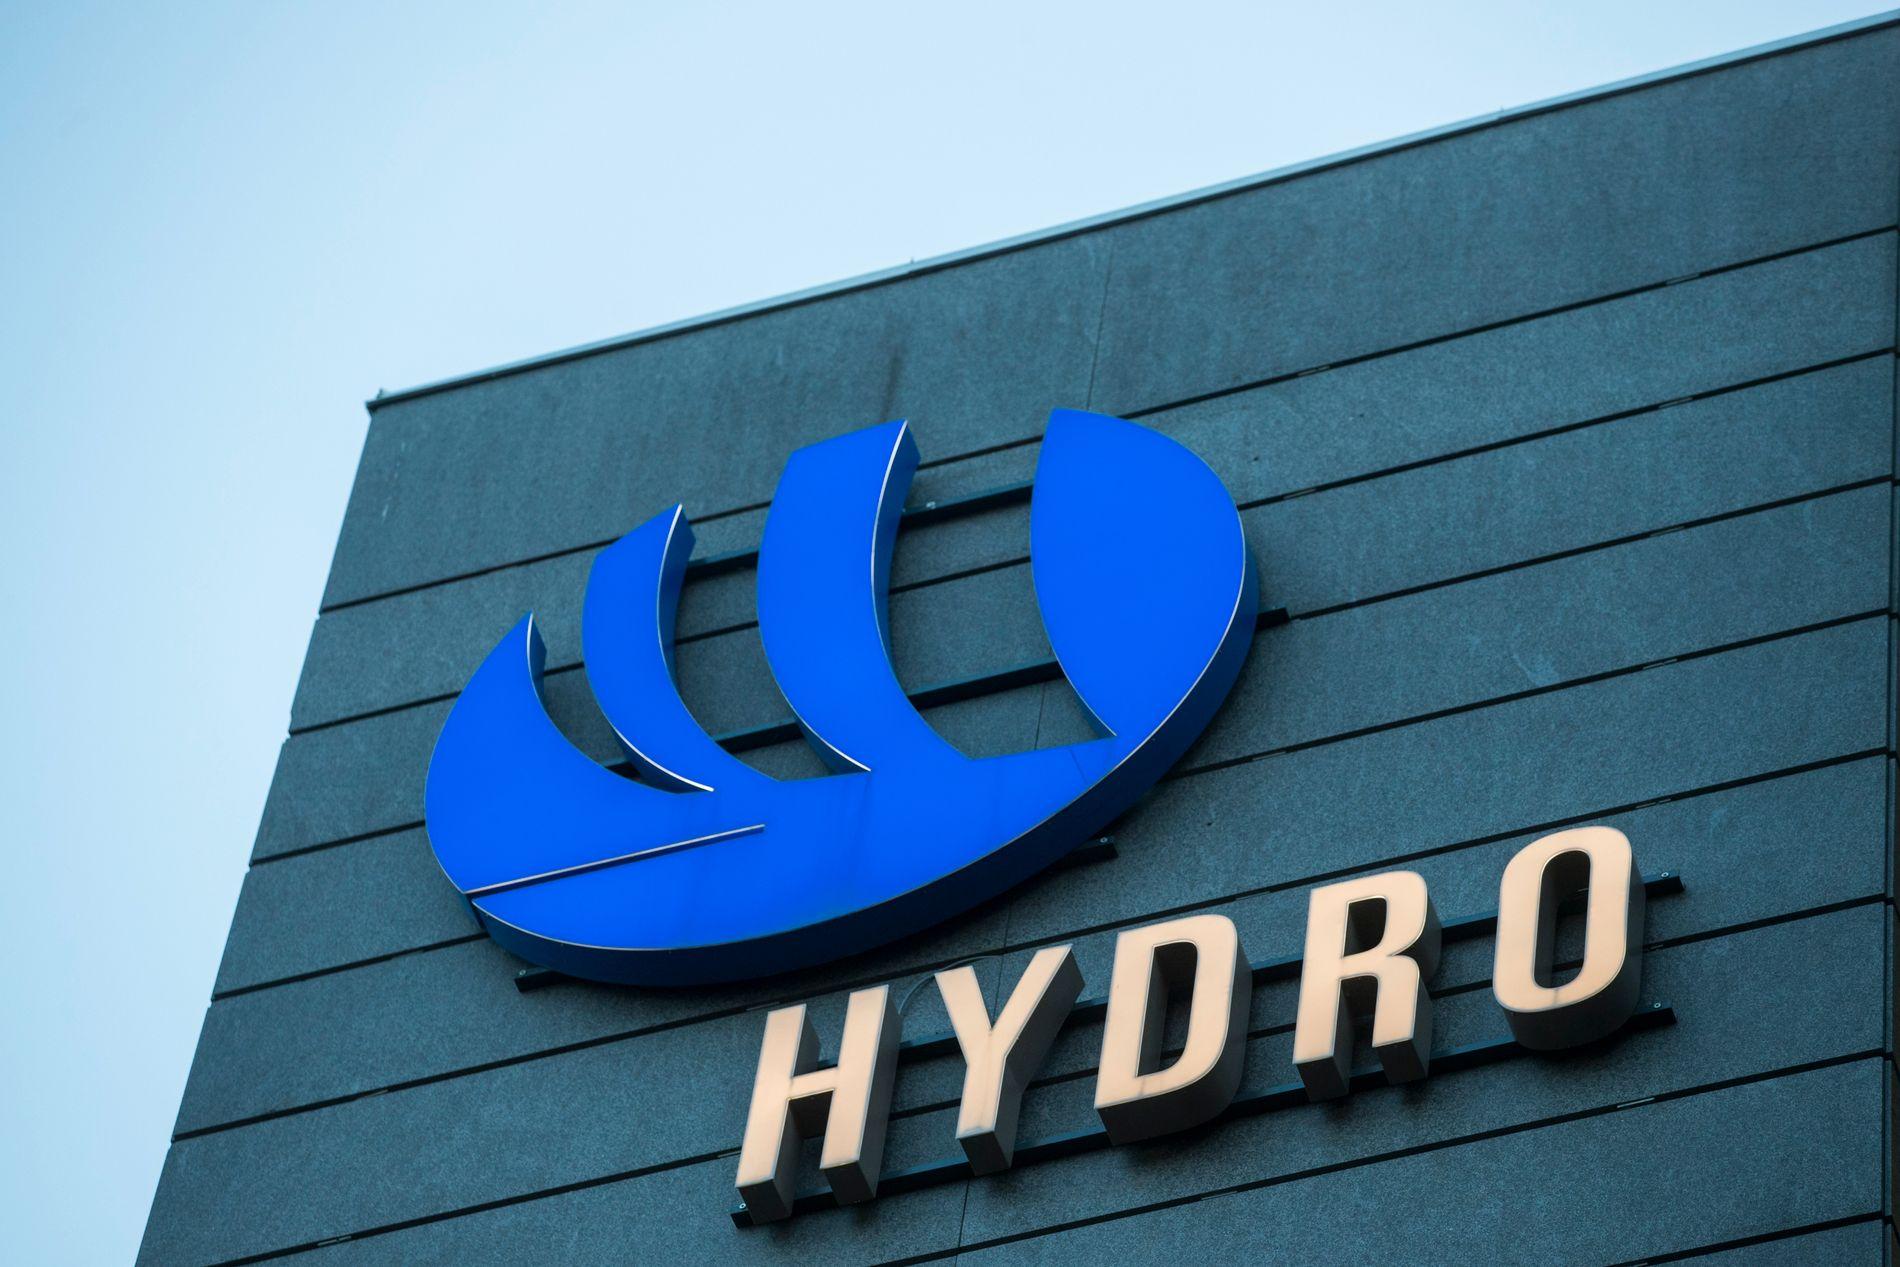 Hydro varsler en betydelig restrukturering. Foto: Håkon Mosvold Larsen / NTB scanpix